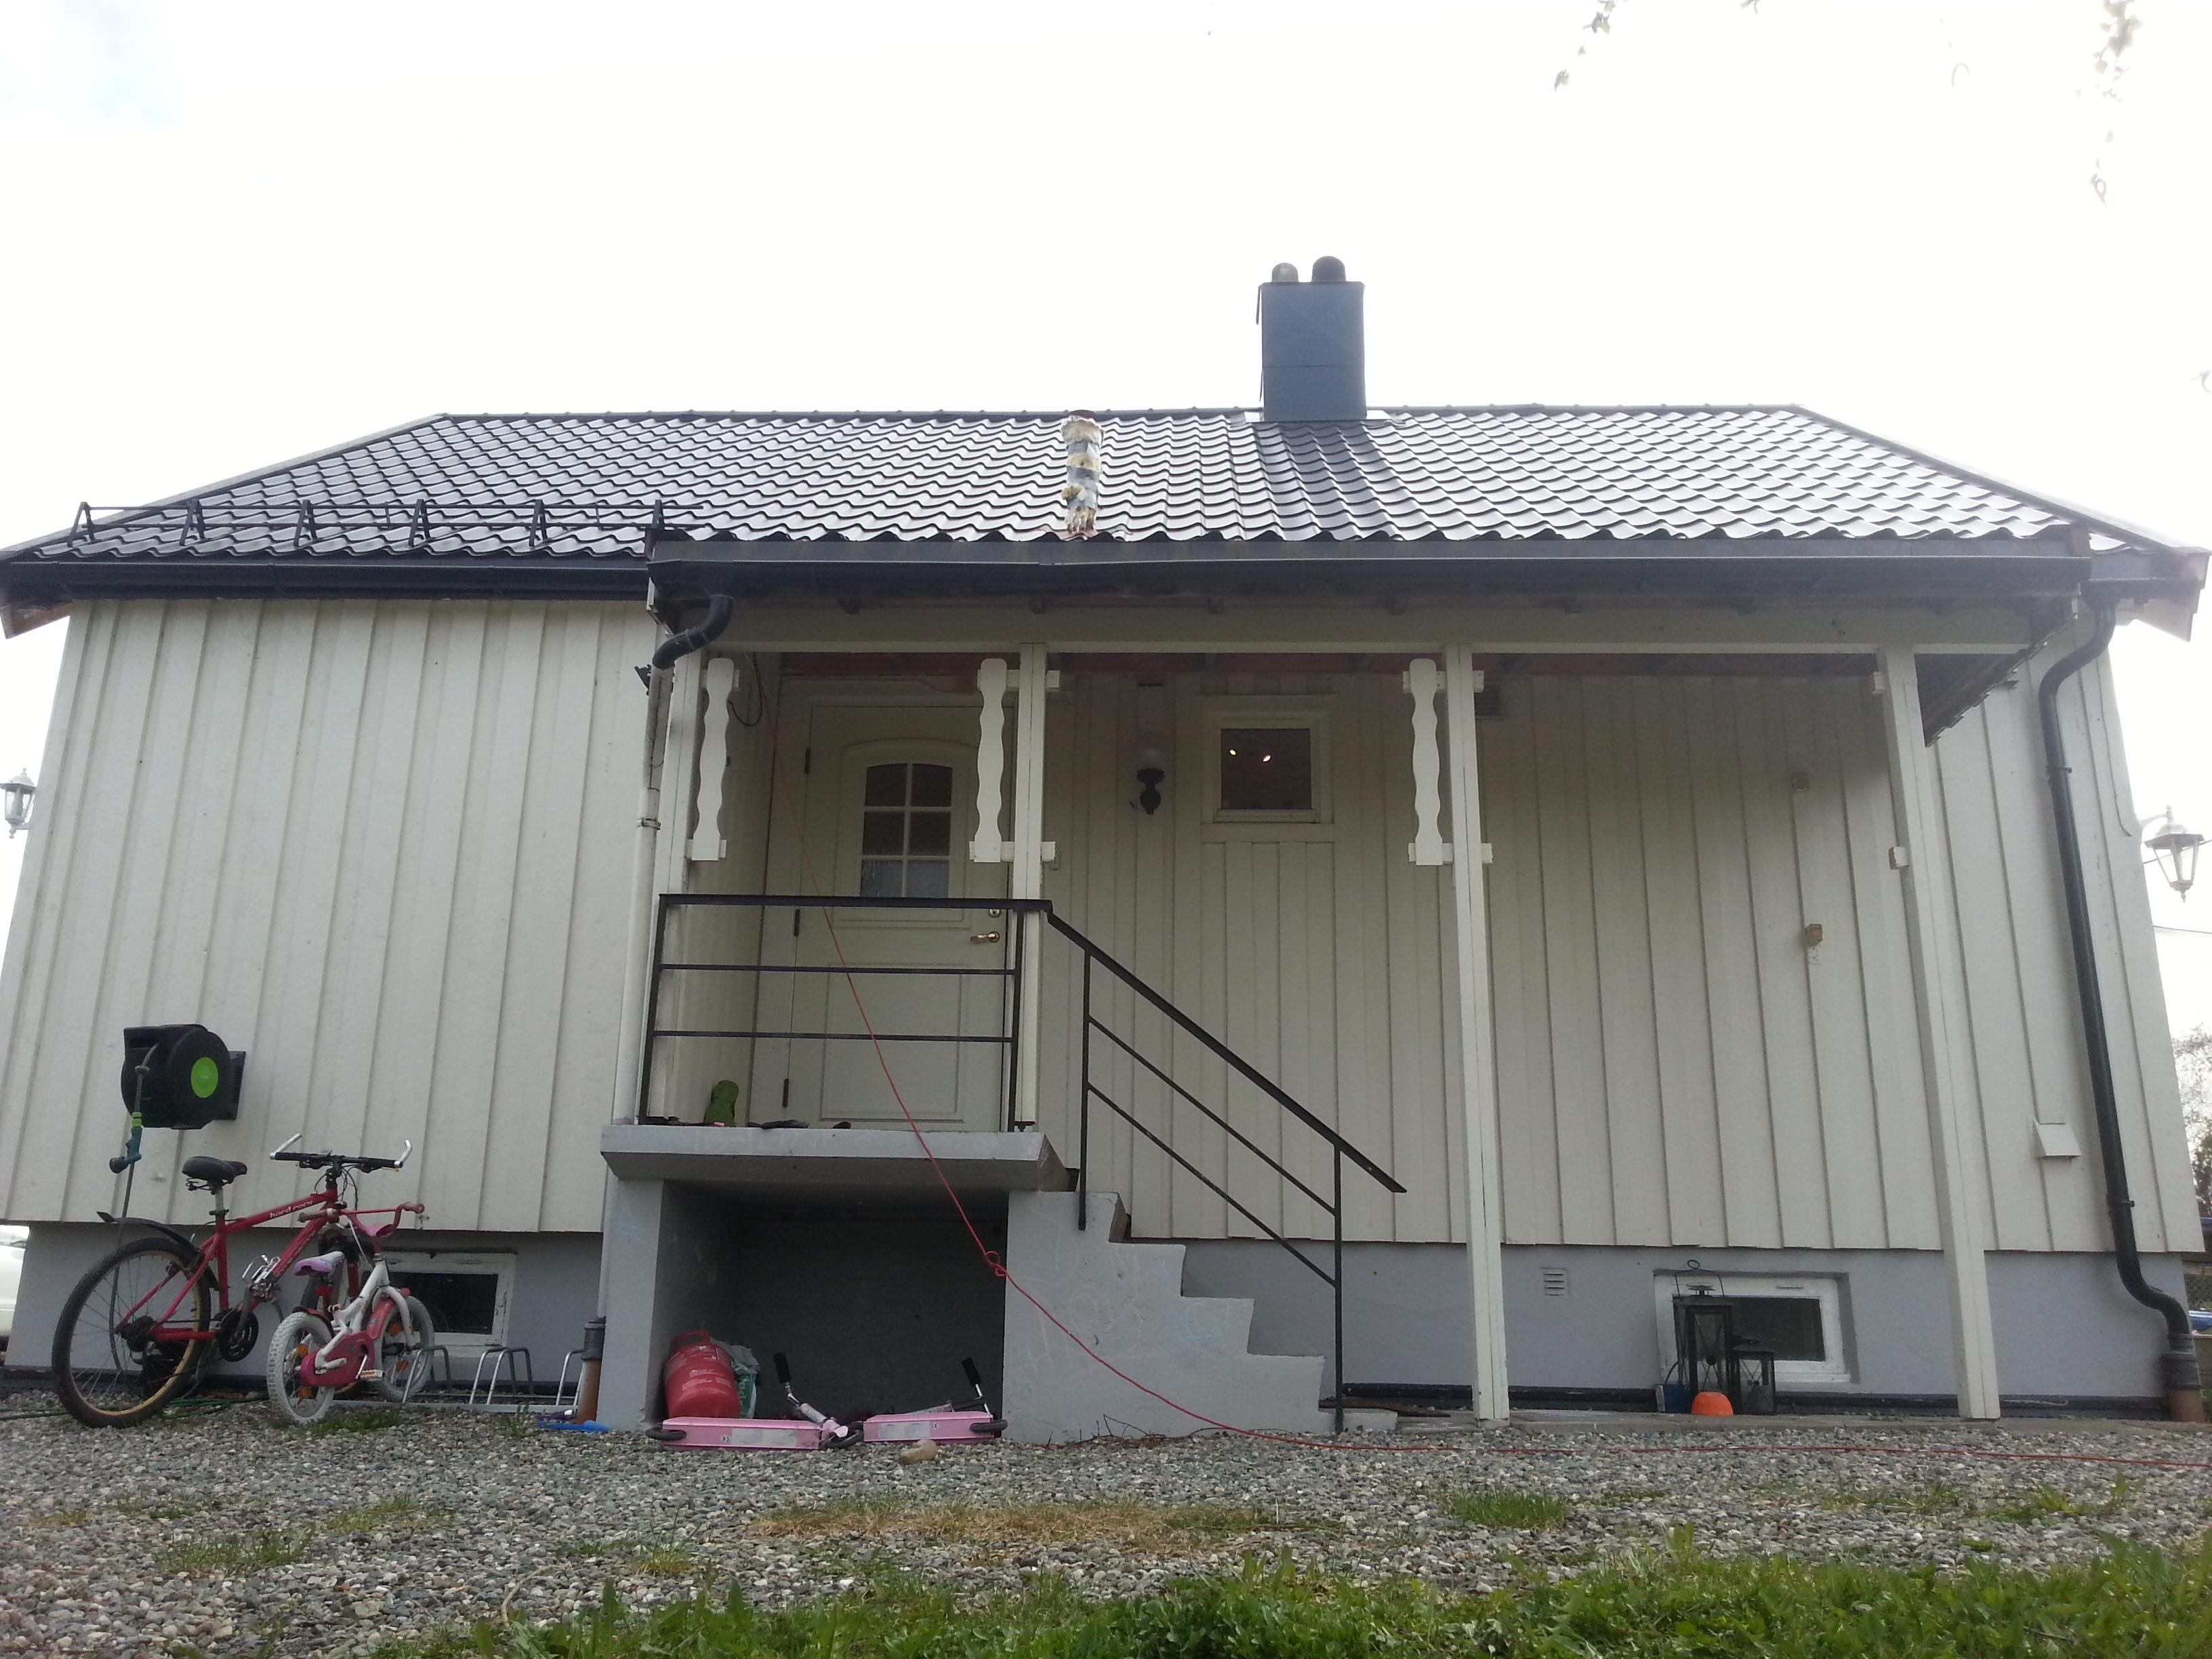 Spongdalsvegen 818, Trondheim Kommune